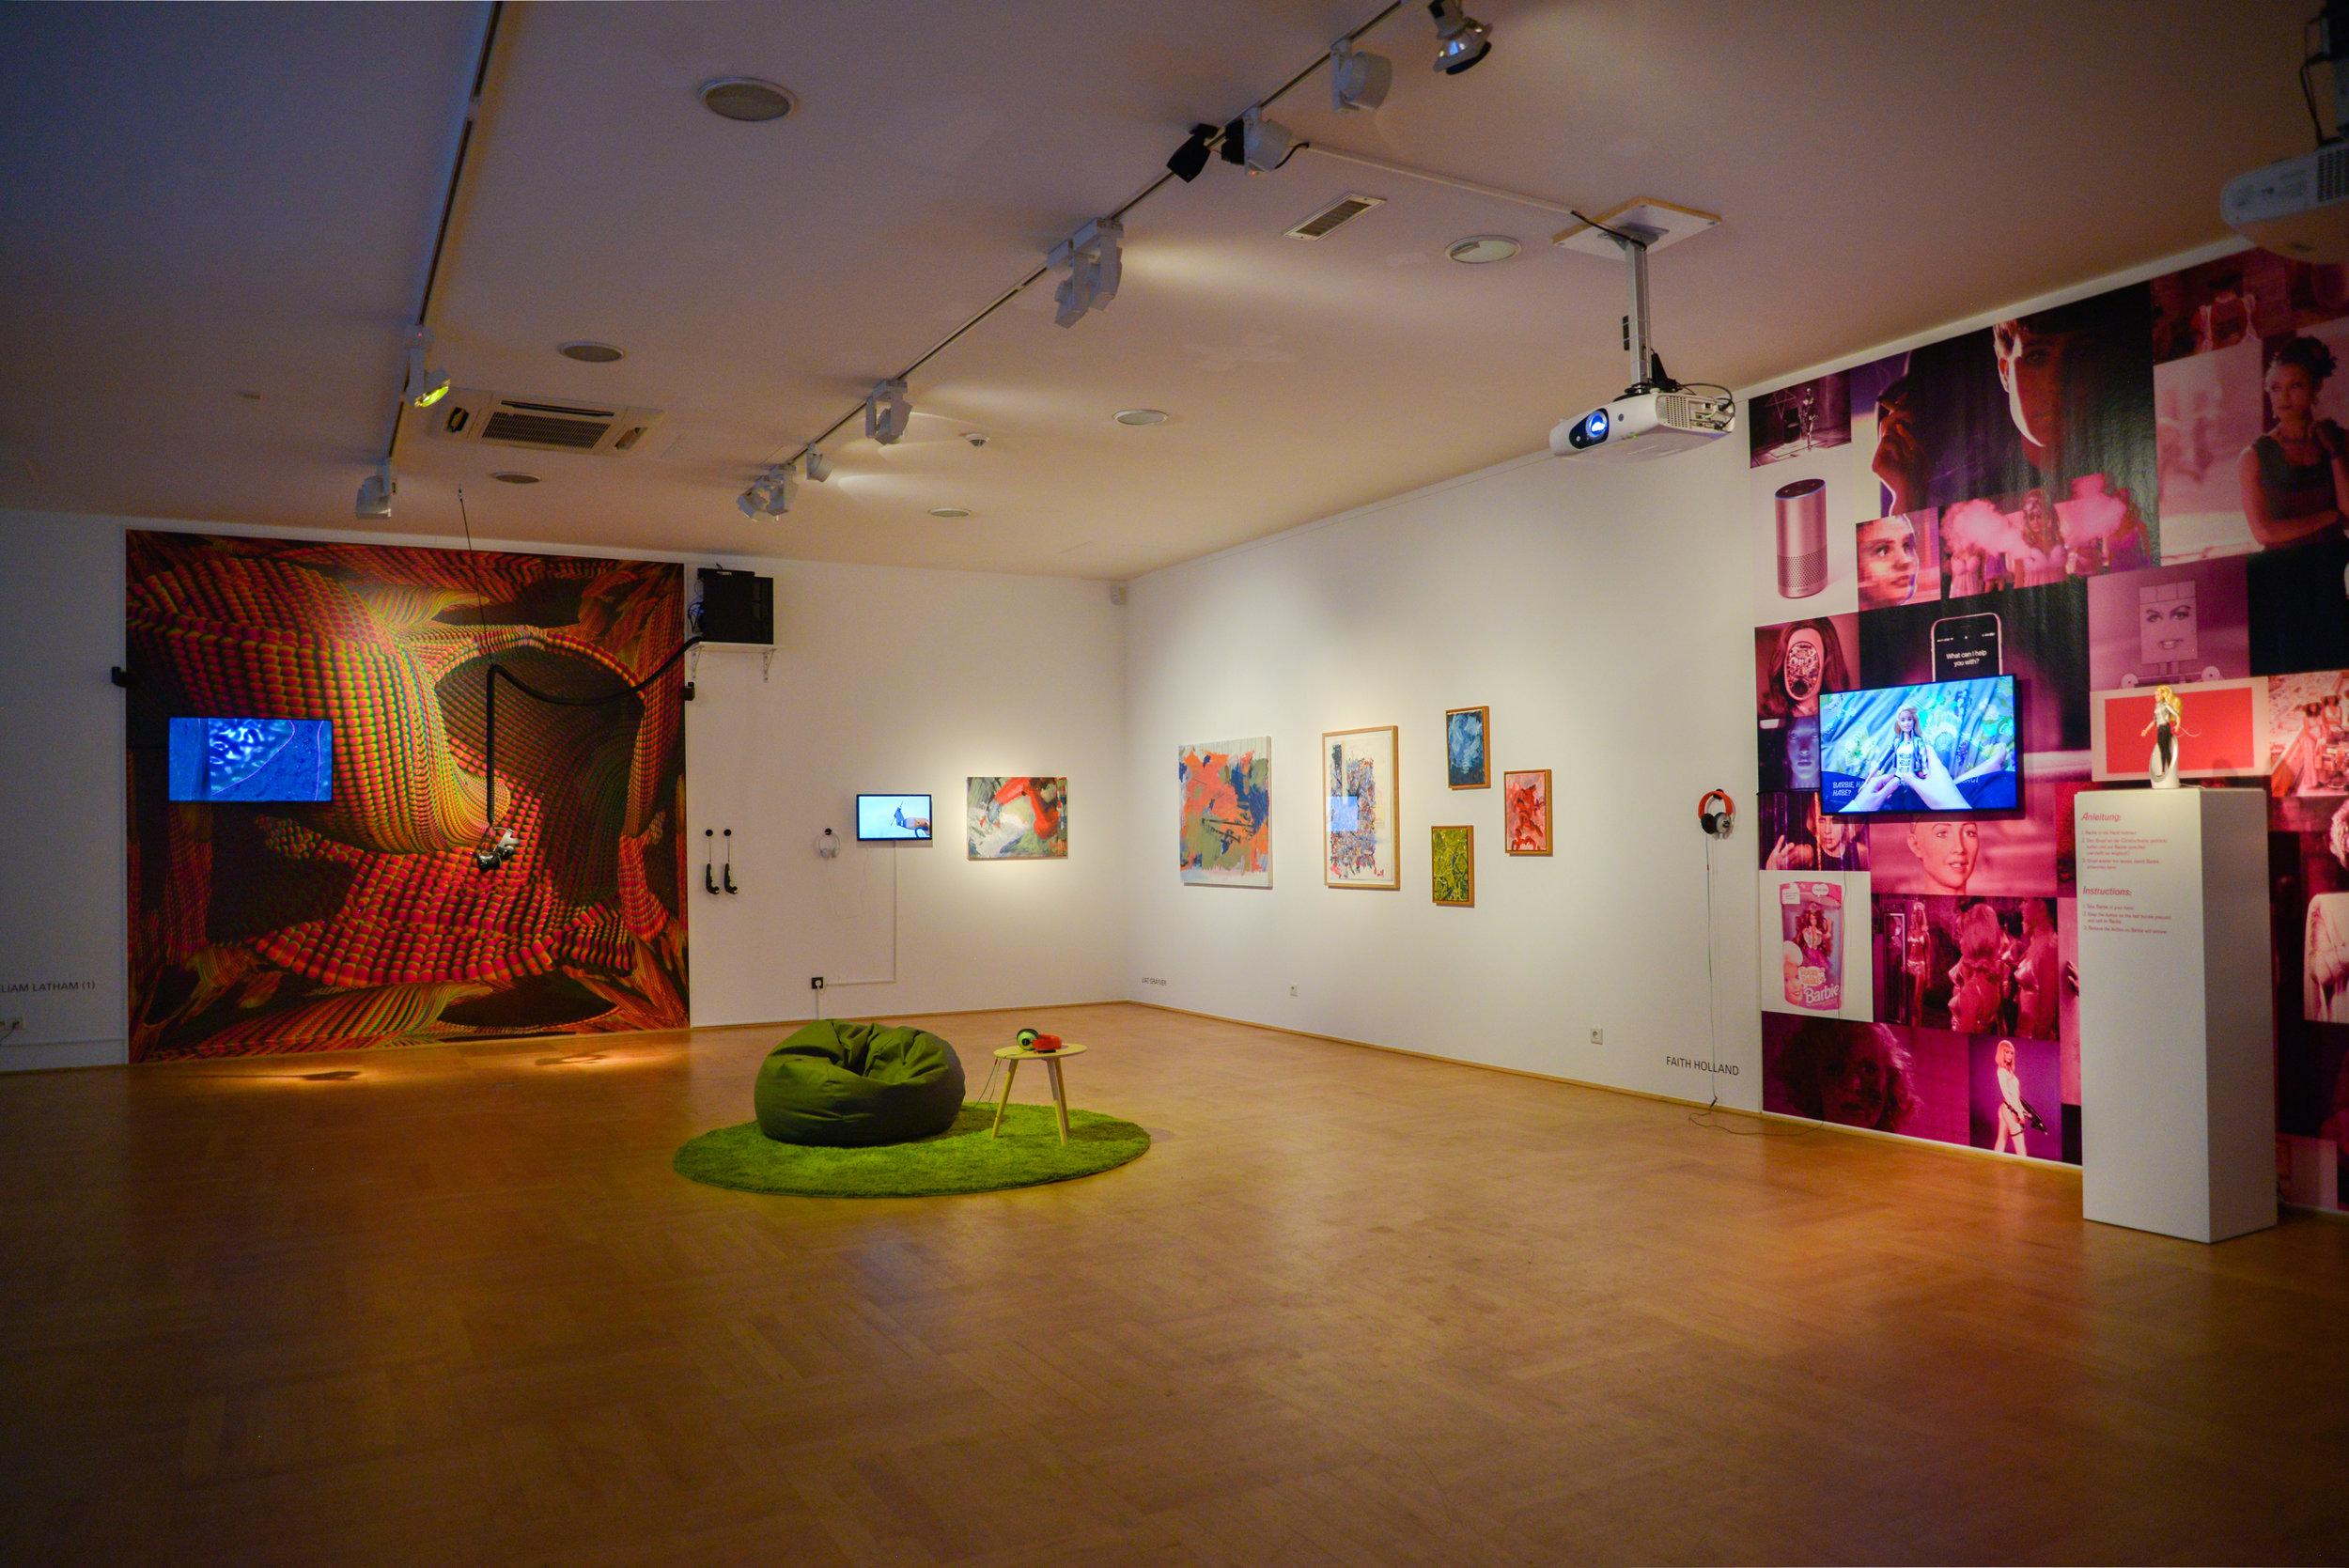 Exhibition view: PENDORAN VINCI, photo © Jonas Blume, 2018